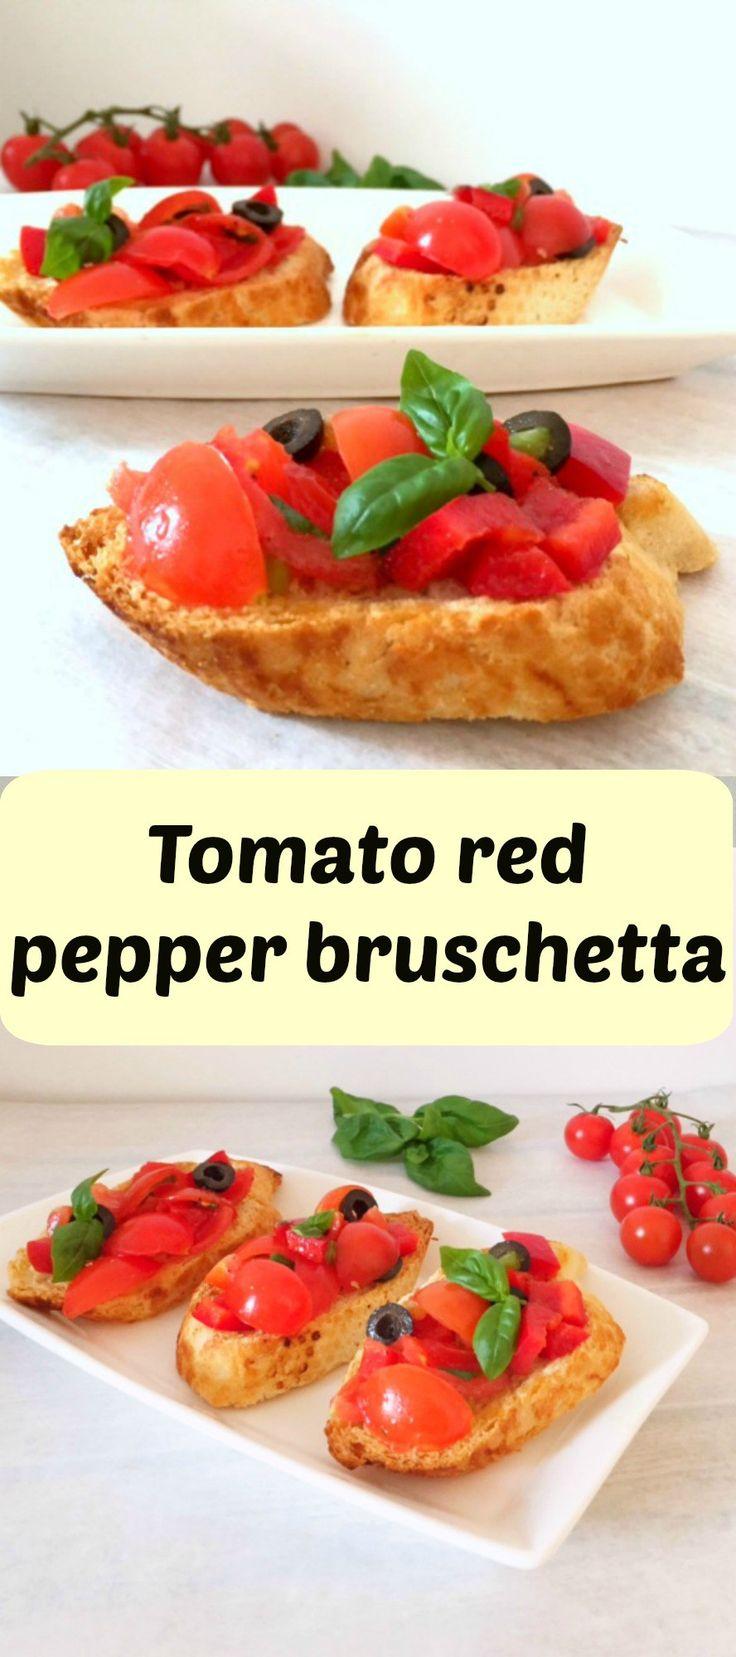 Tomato red pepper bruschetta, a posh and tasty Italian starter for any occasion.